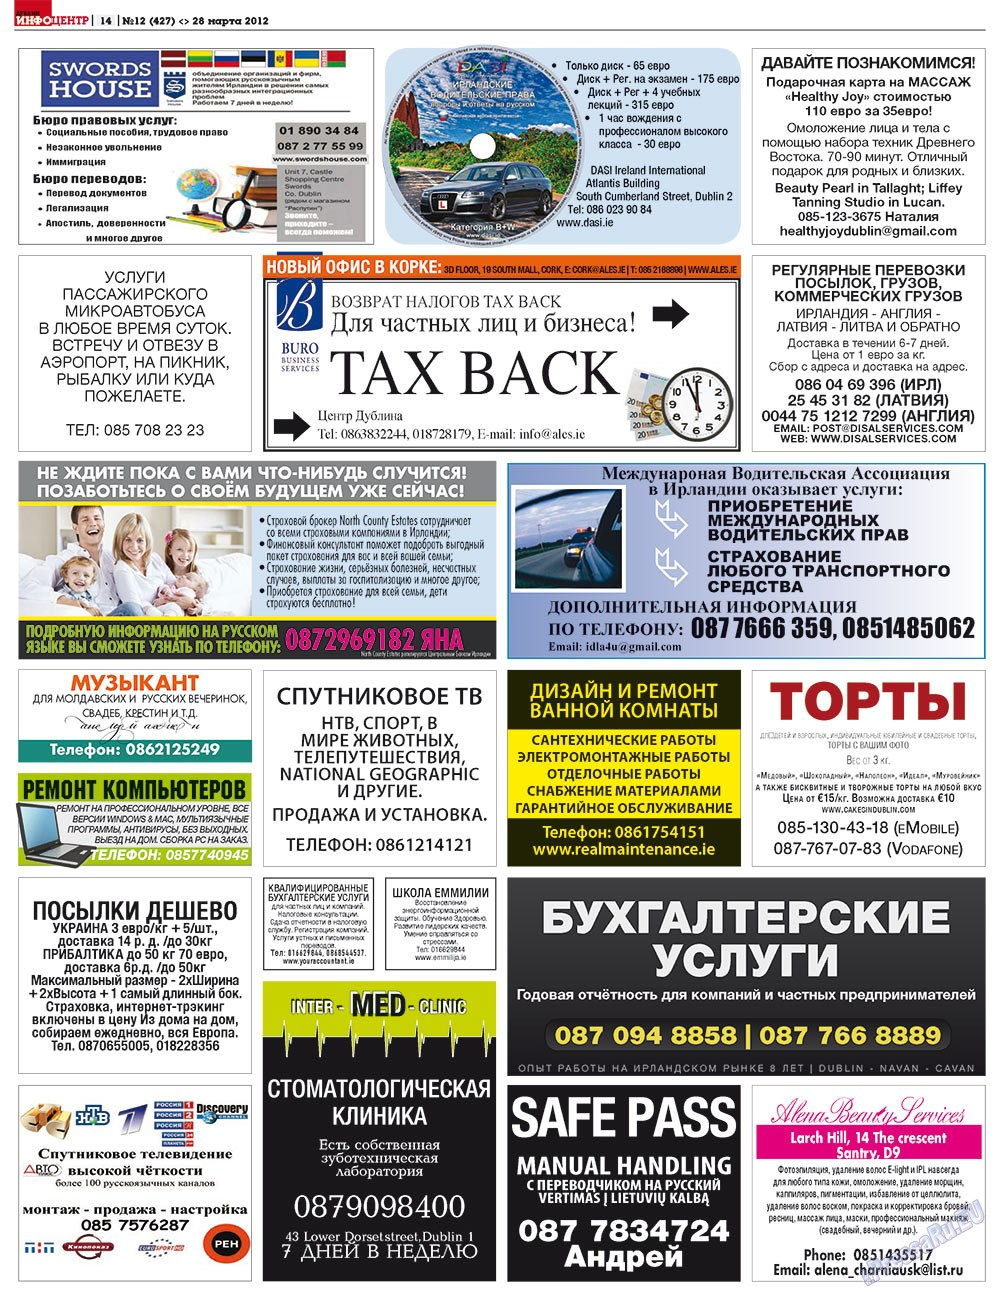 Дублин инфоцентр (газета). 2012 год, номер 12, стр. 14